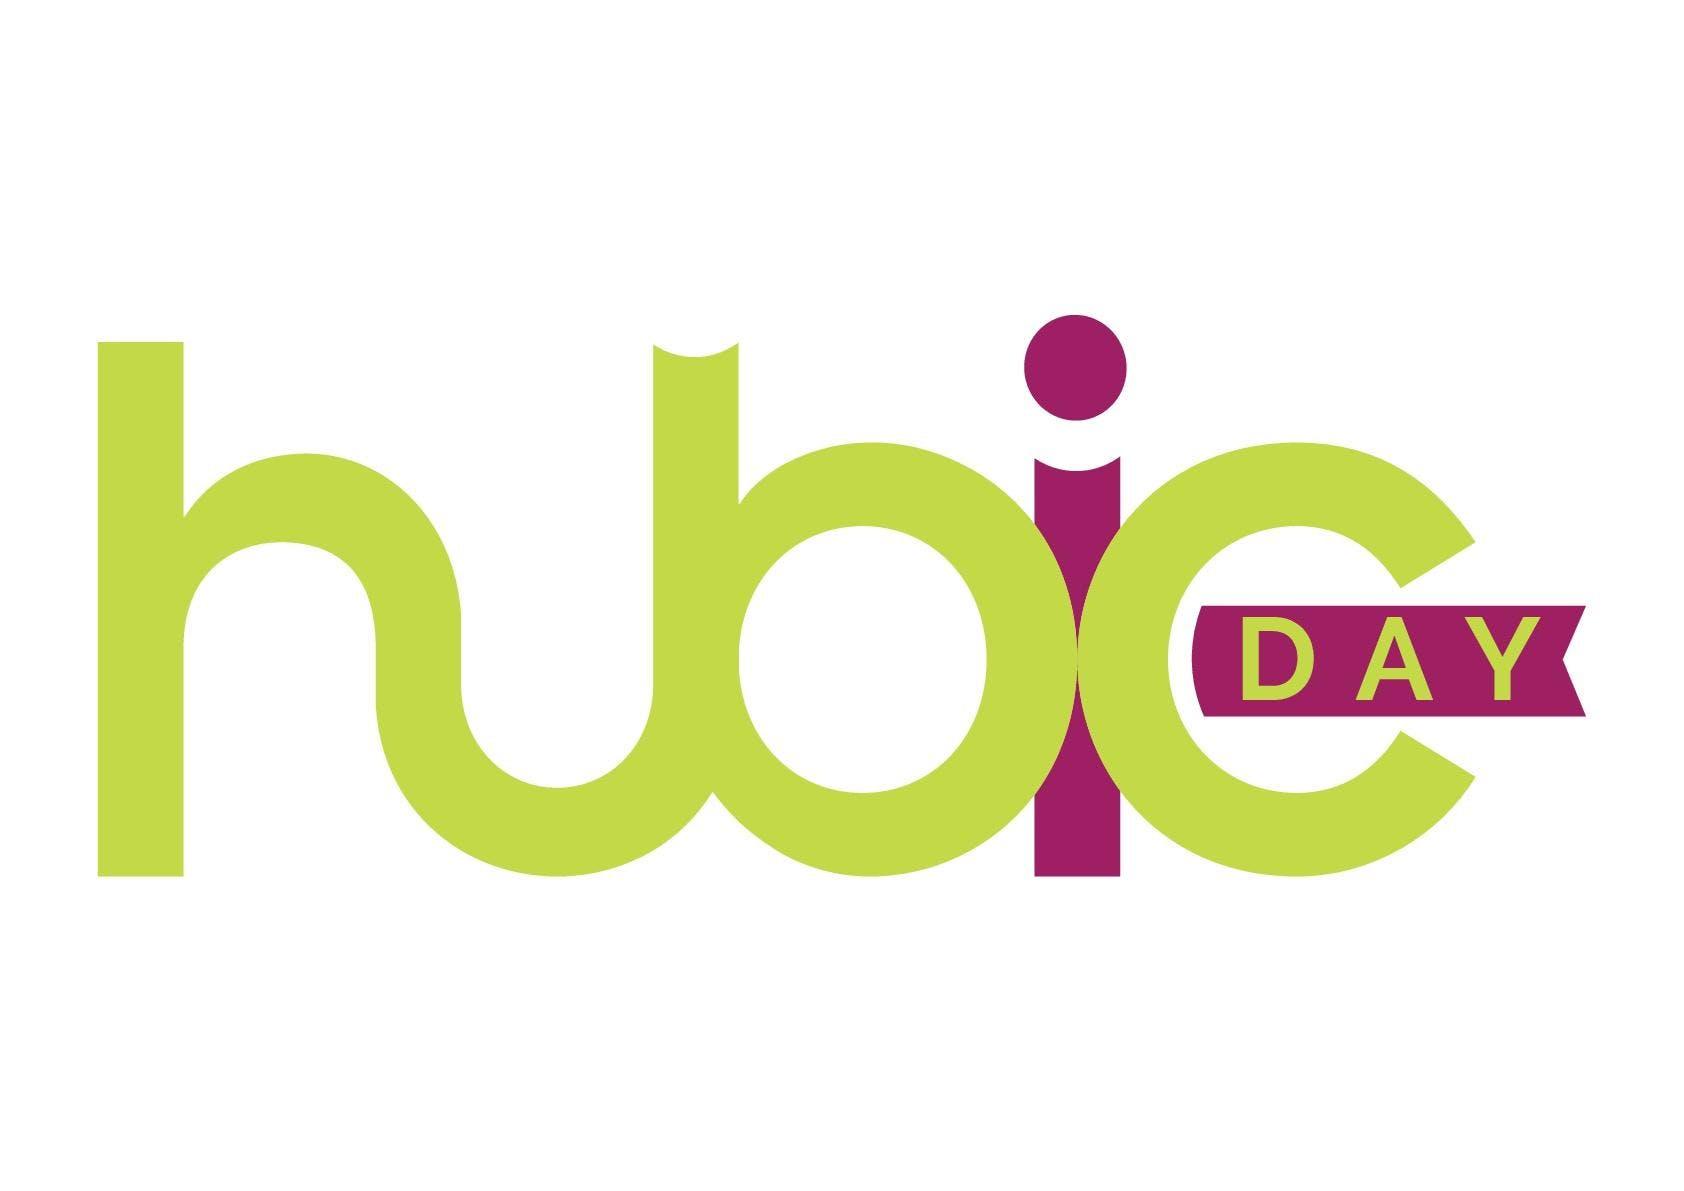 Hubic day Borgo San Lorenzo | Seminario gratuito su Web & Social Media